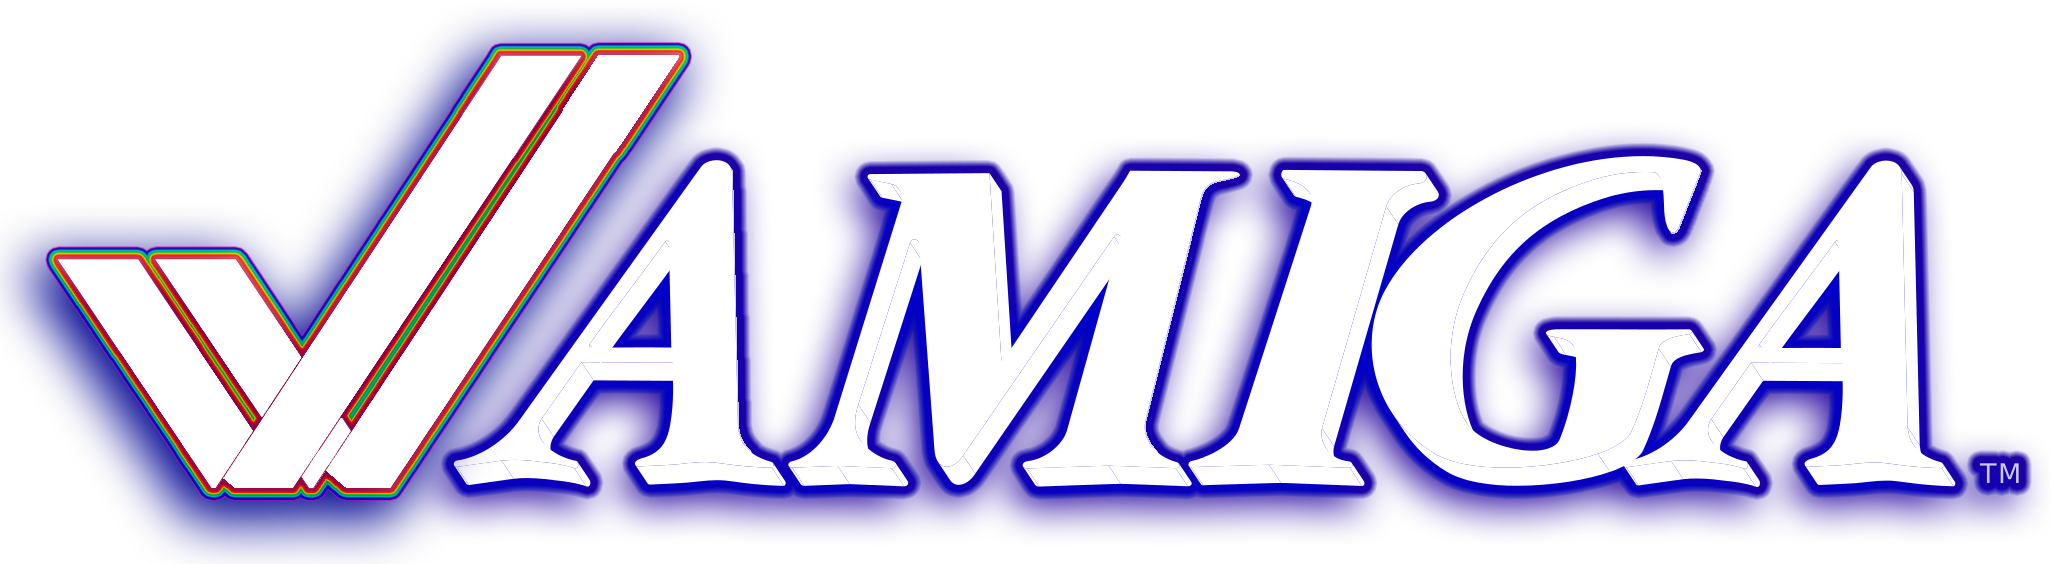 Neon Platorm Clear Logos.